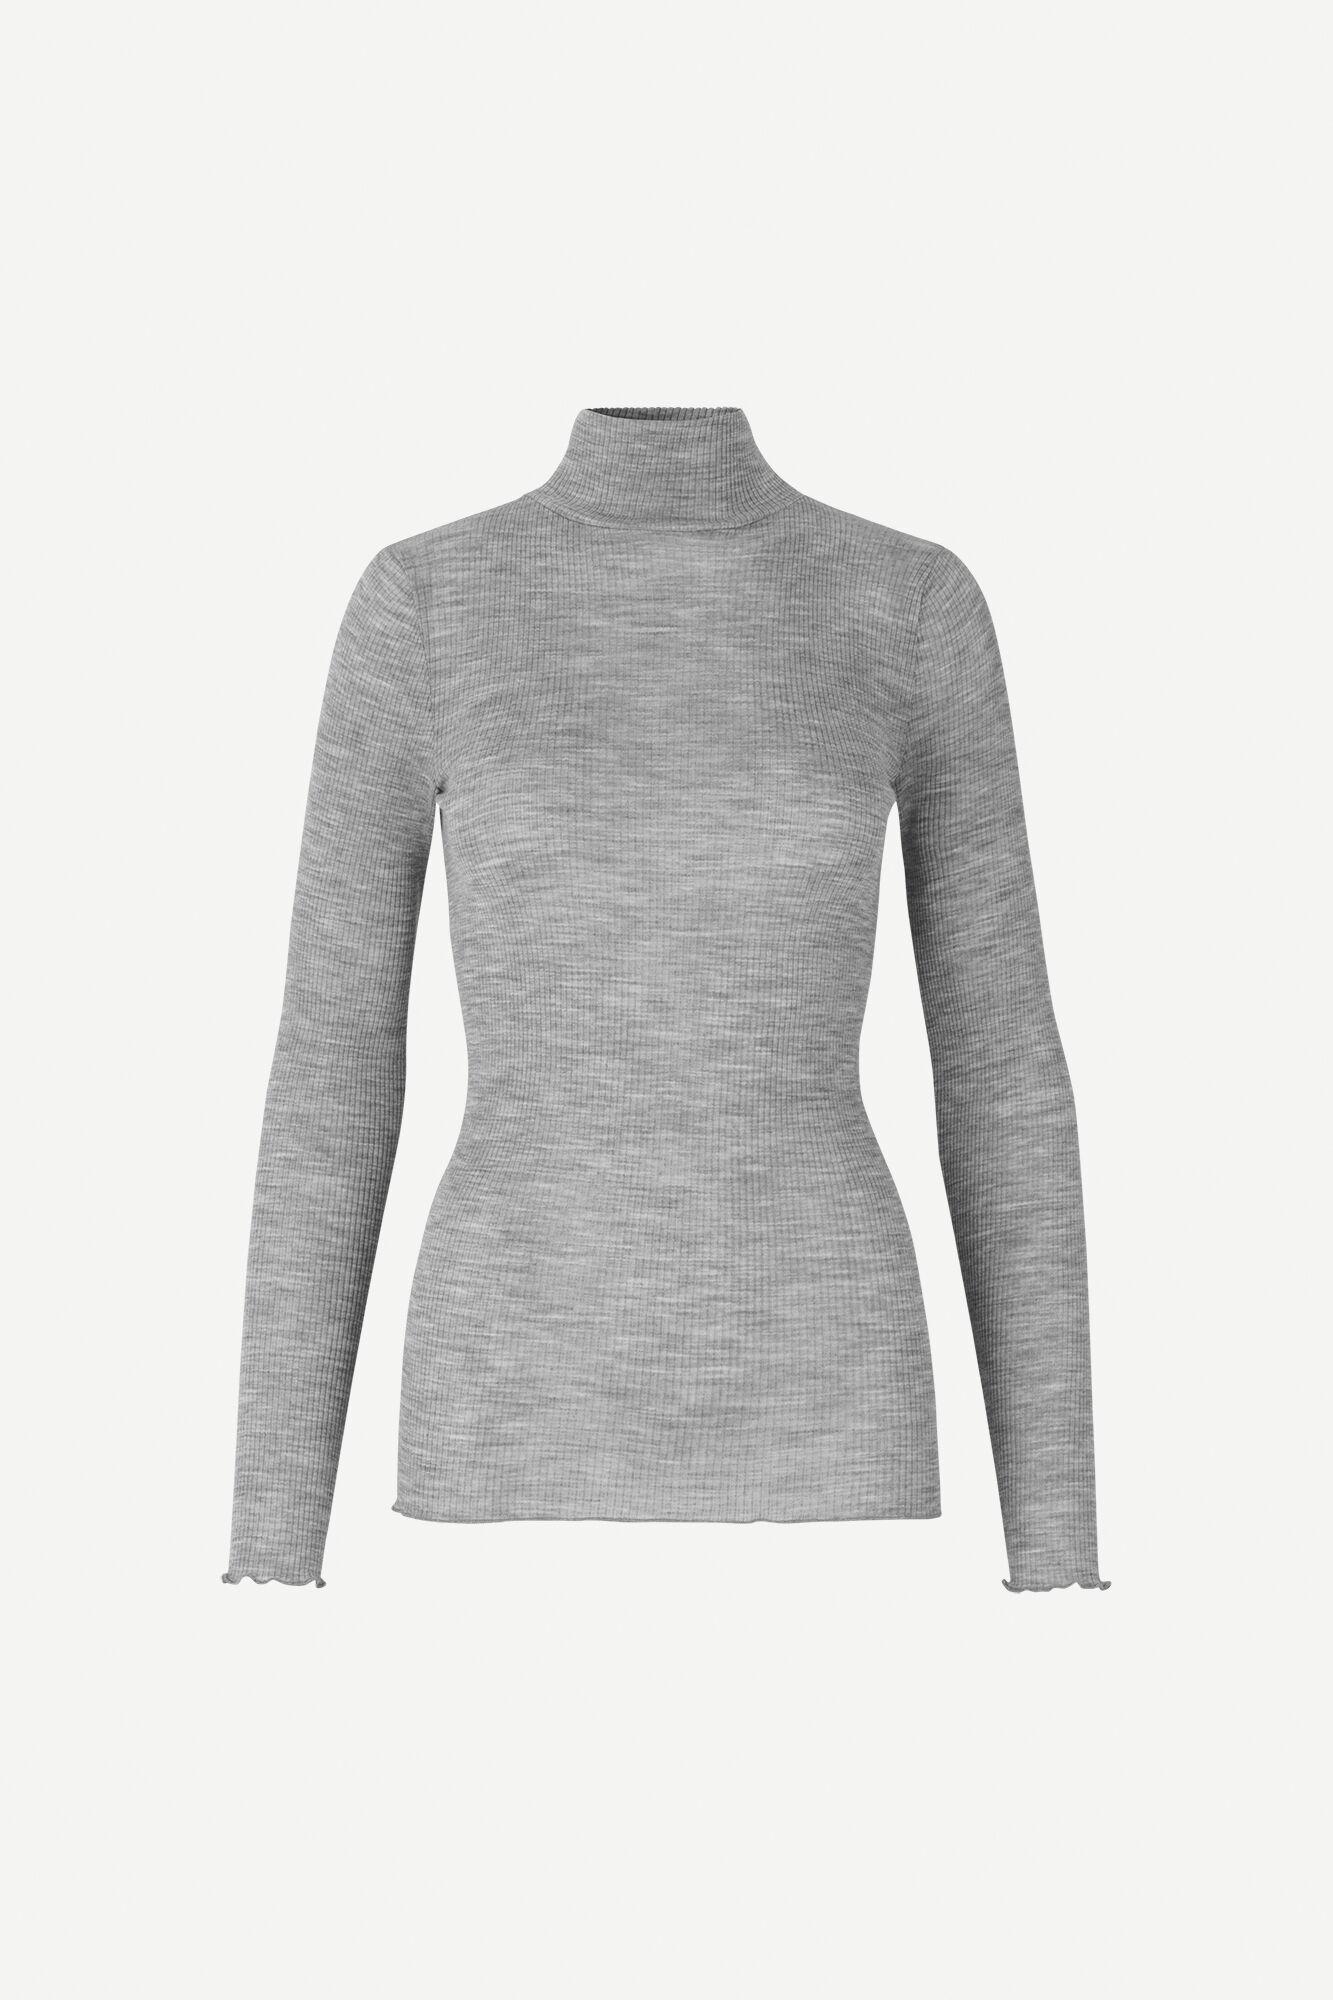 Cupidon t-n t-shirt ls 13020